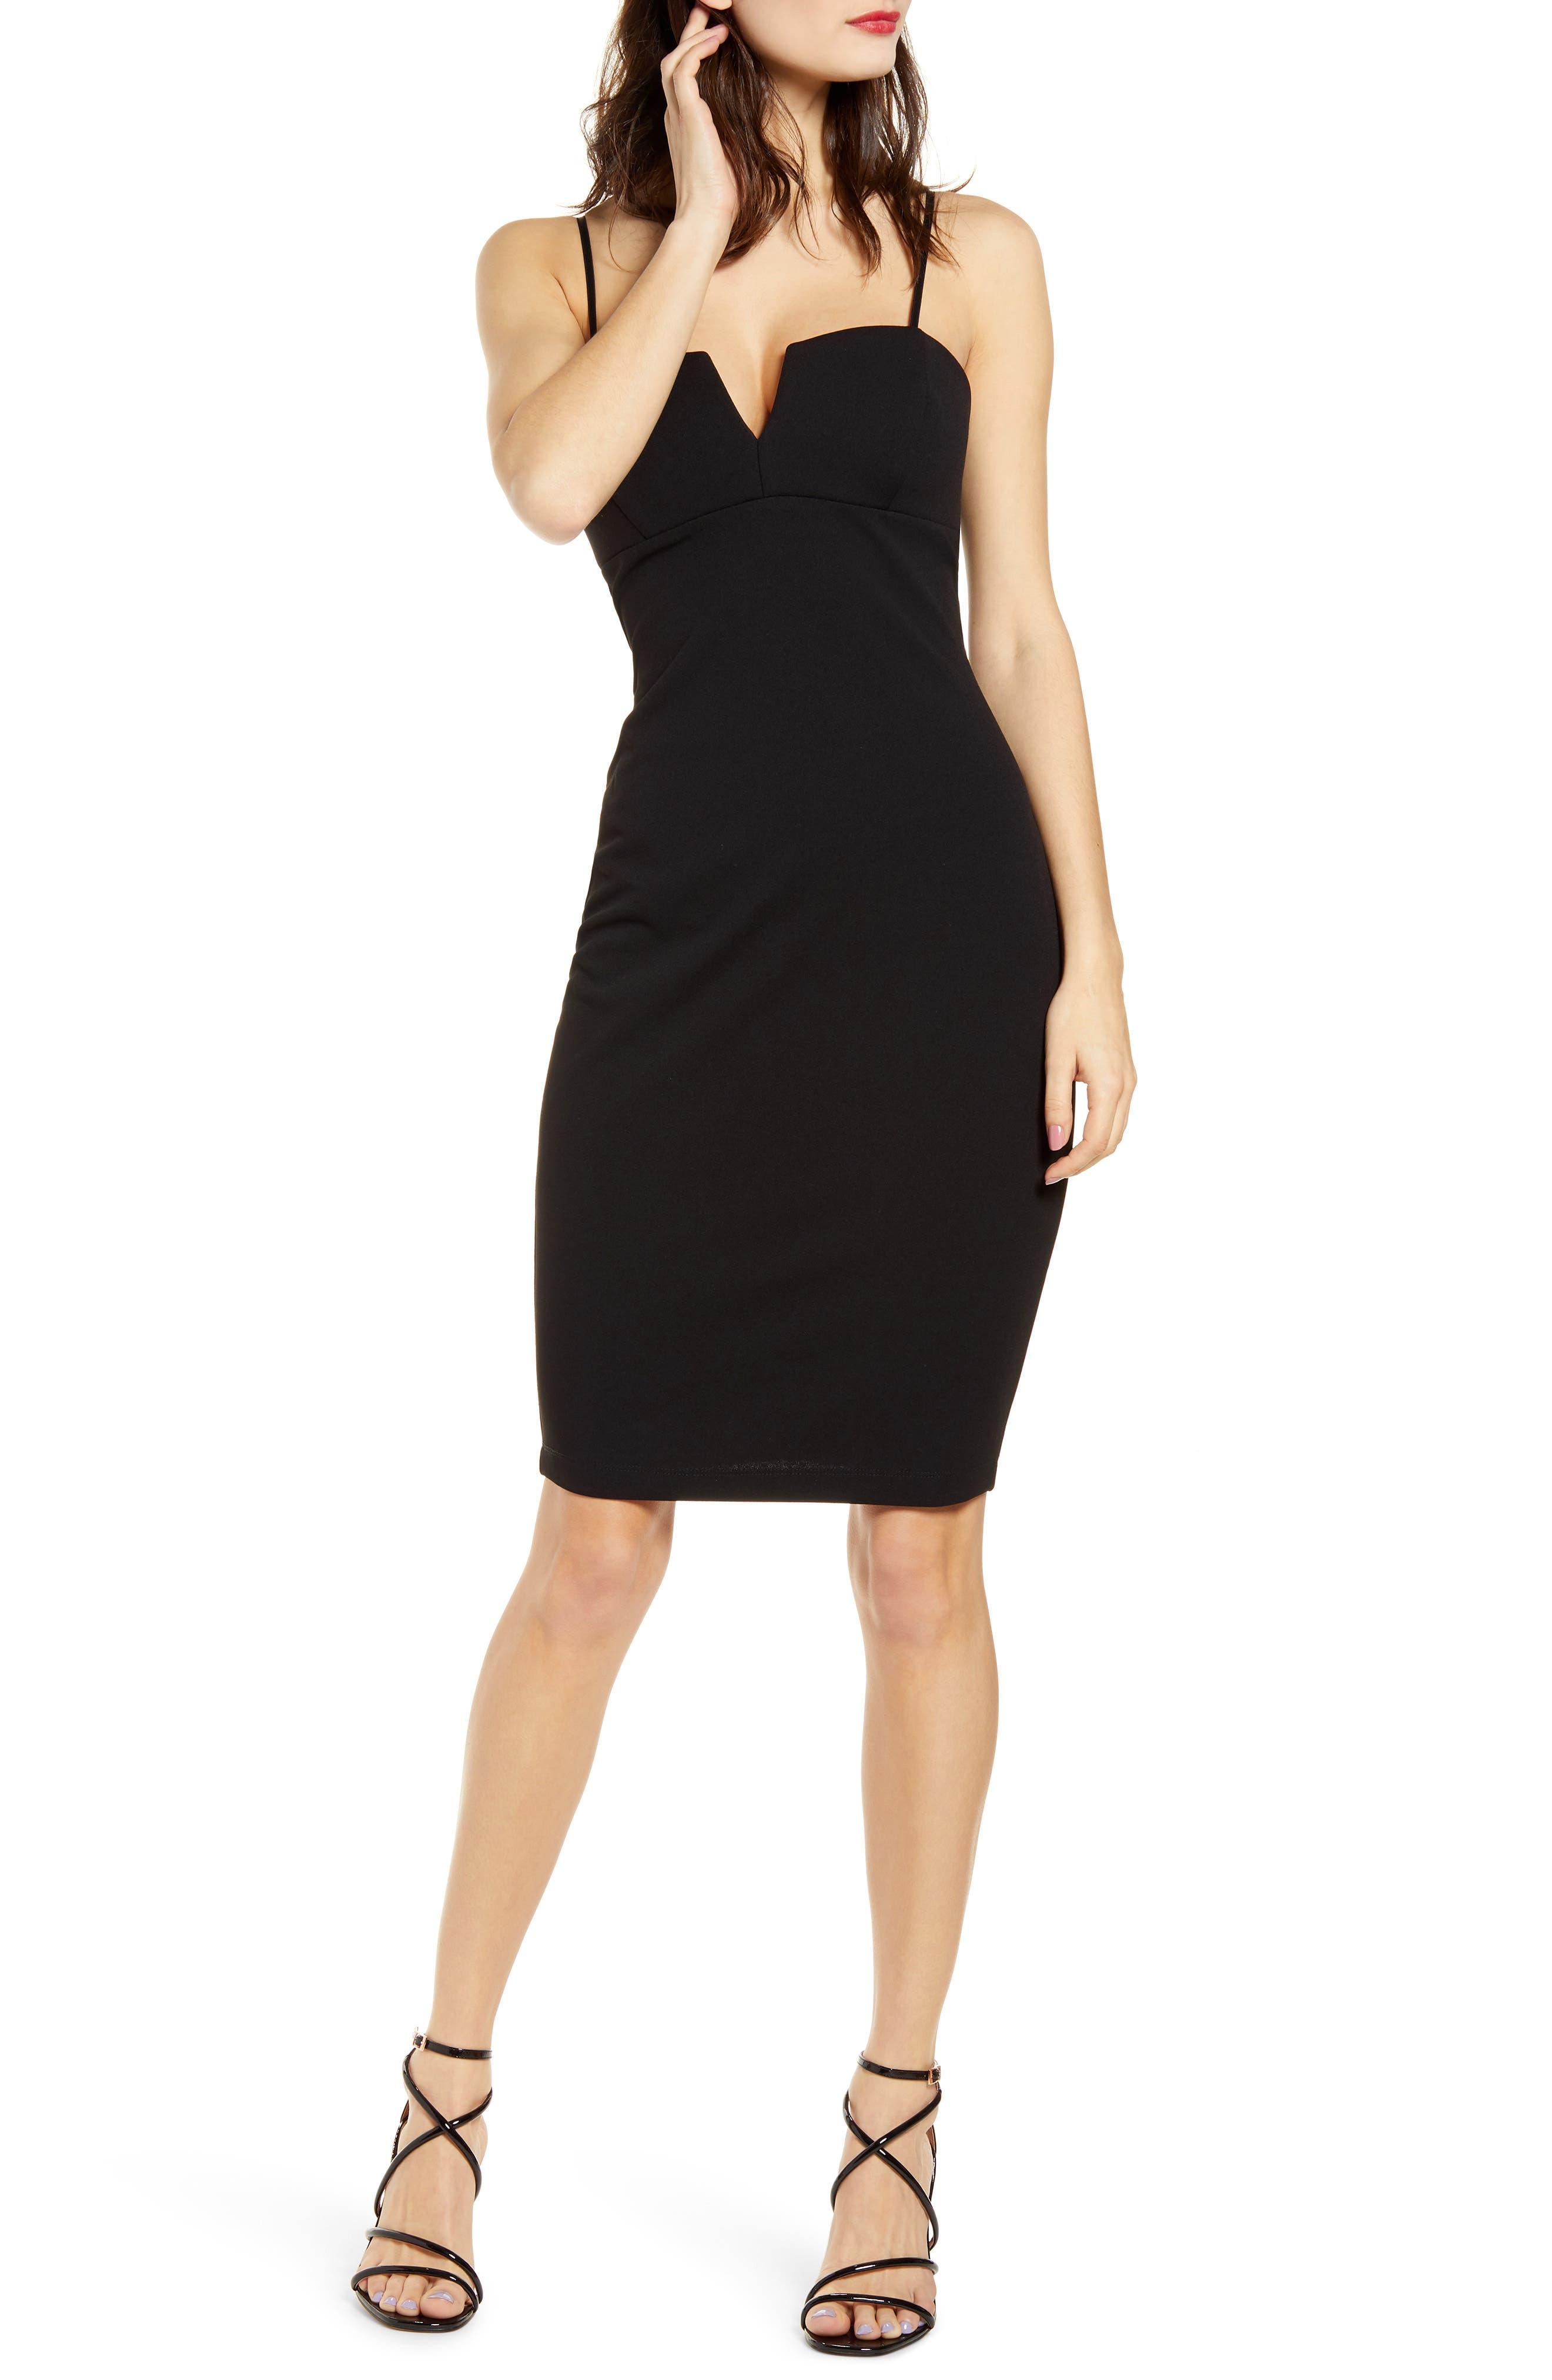 Love, Nickie Lew Notch Detail Body-Con Midi Dress, Black